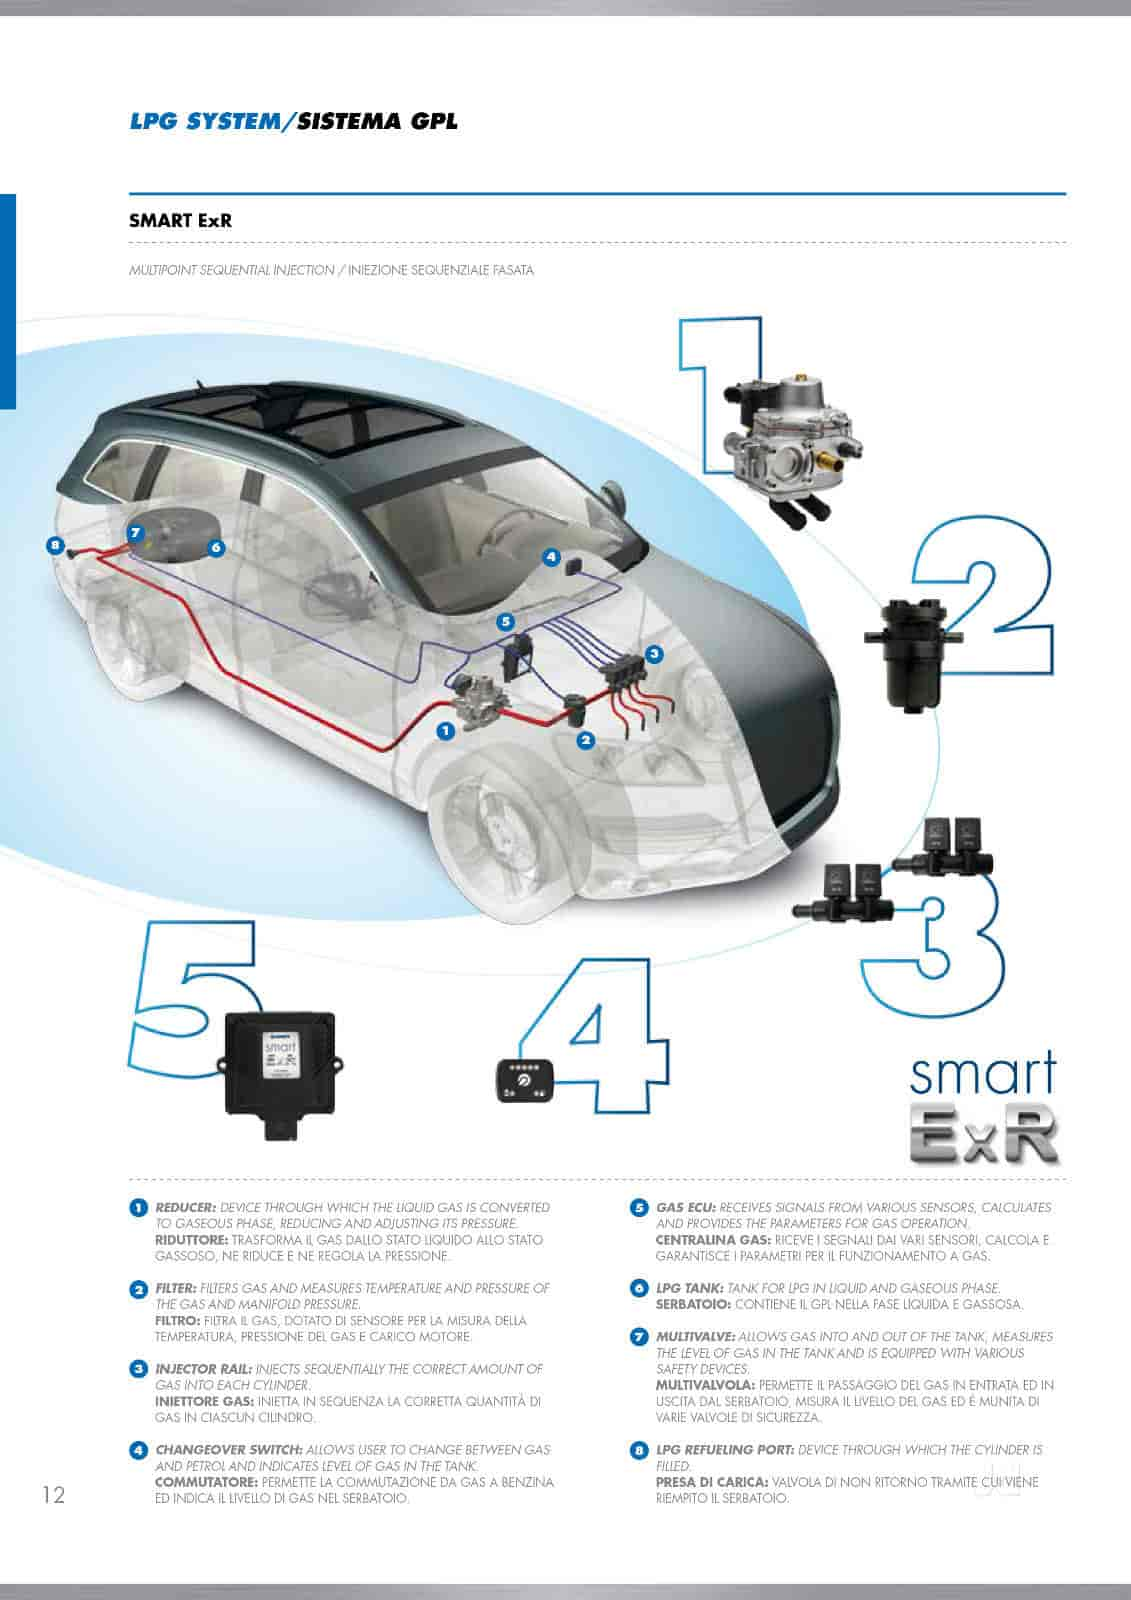 Starterzug cable Bowden estárter tren motor diésel de inicio original VW t4 701711502a